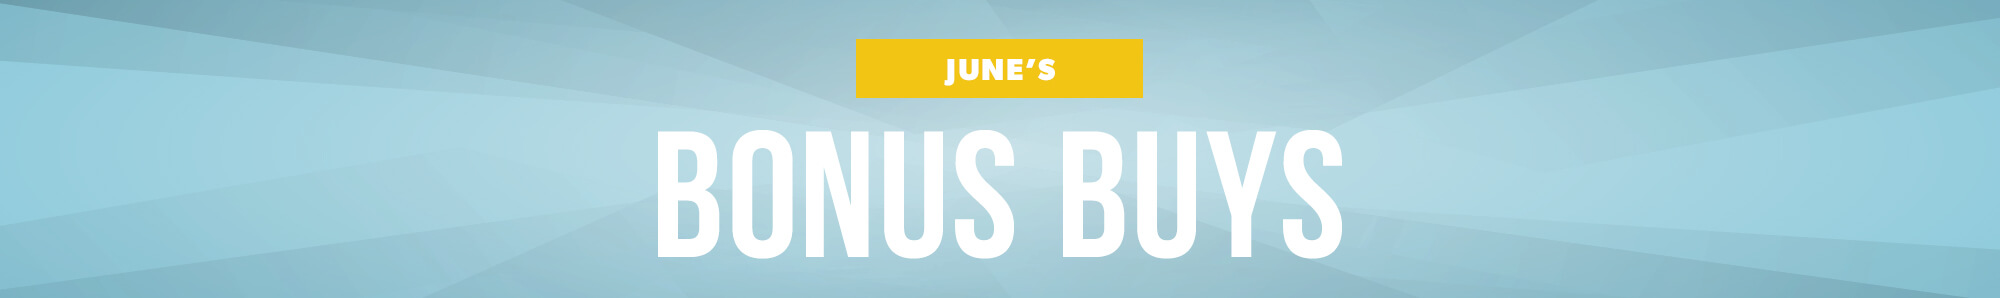 June Deals